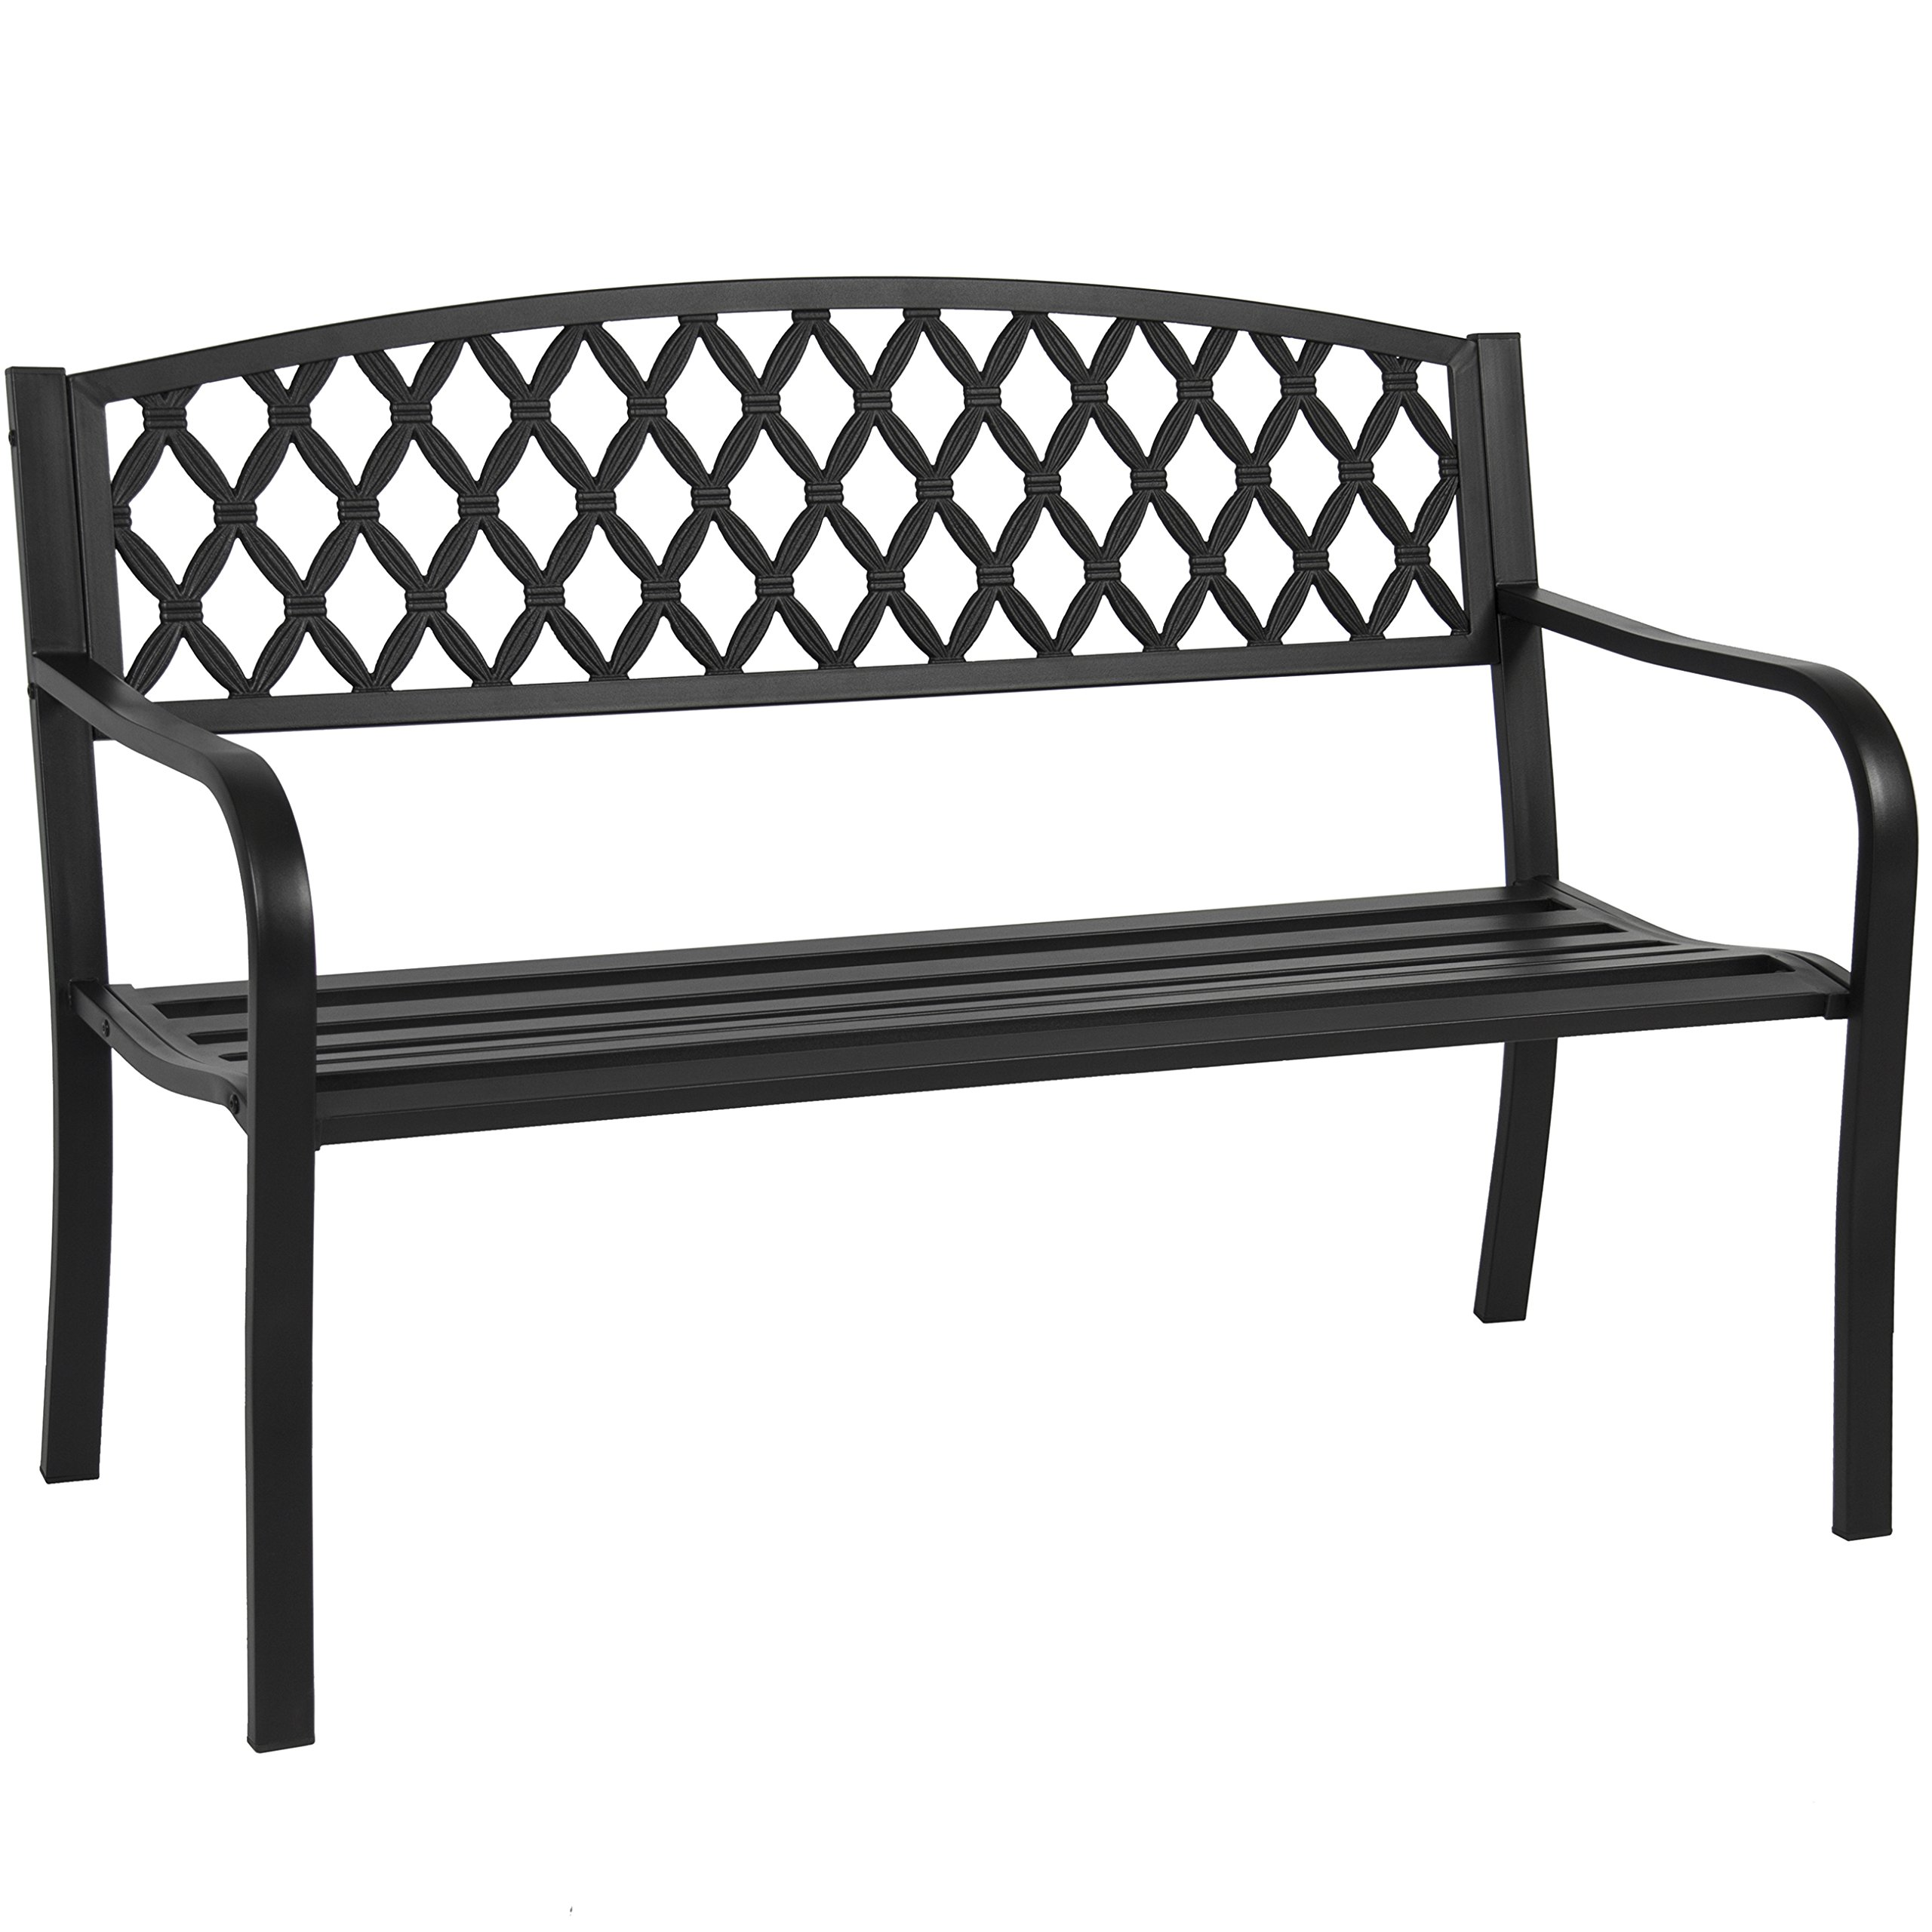 Best Choice Products 50in Steel Outdoor Patio Garden Park Bench Porch Chair Yard Furniture w/Cross Design - Black